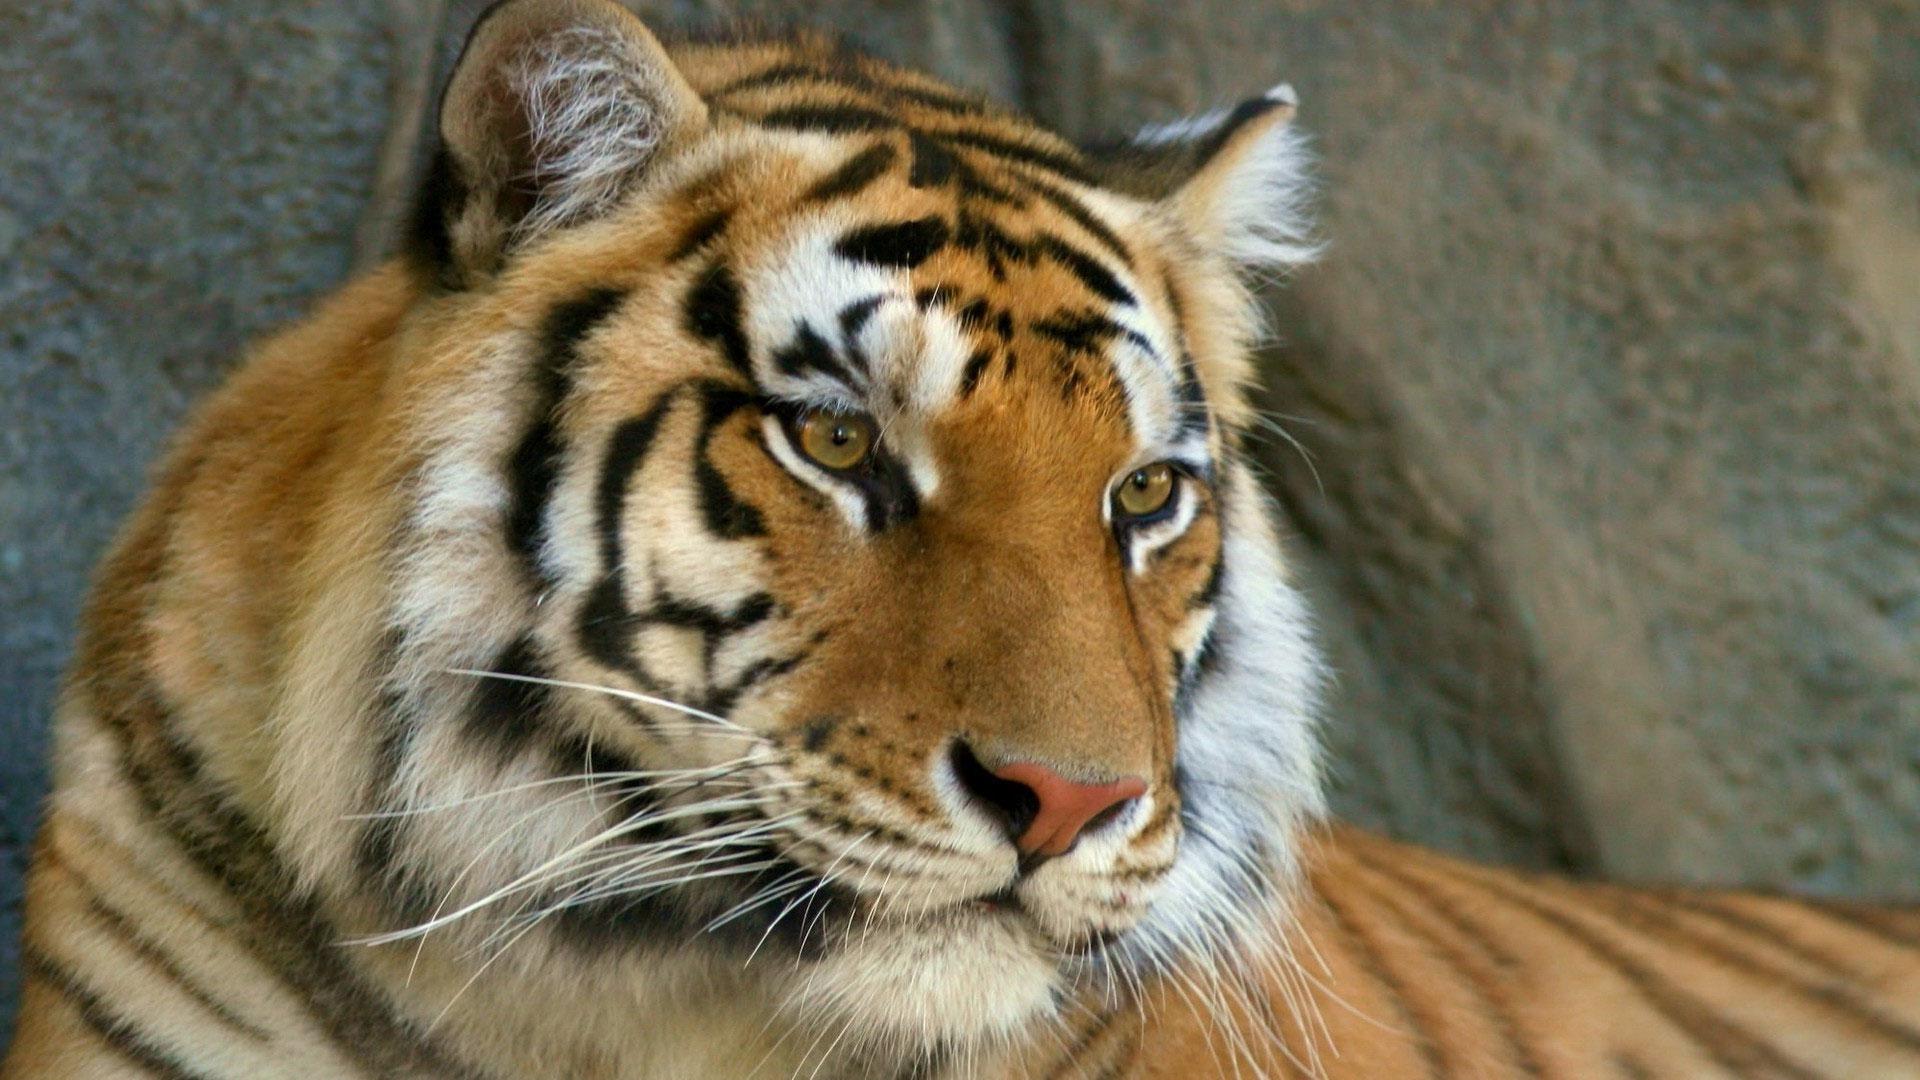 Wallpaper Mustache Face Tiger Eyes Predator 1920x1080